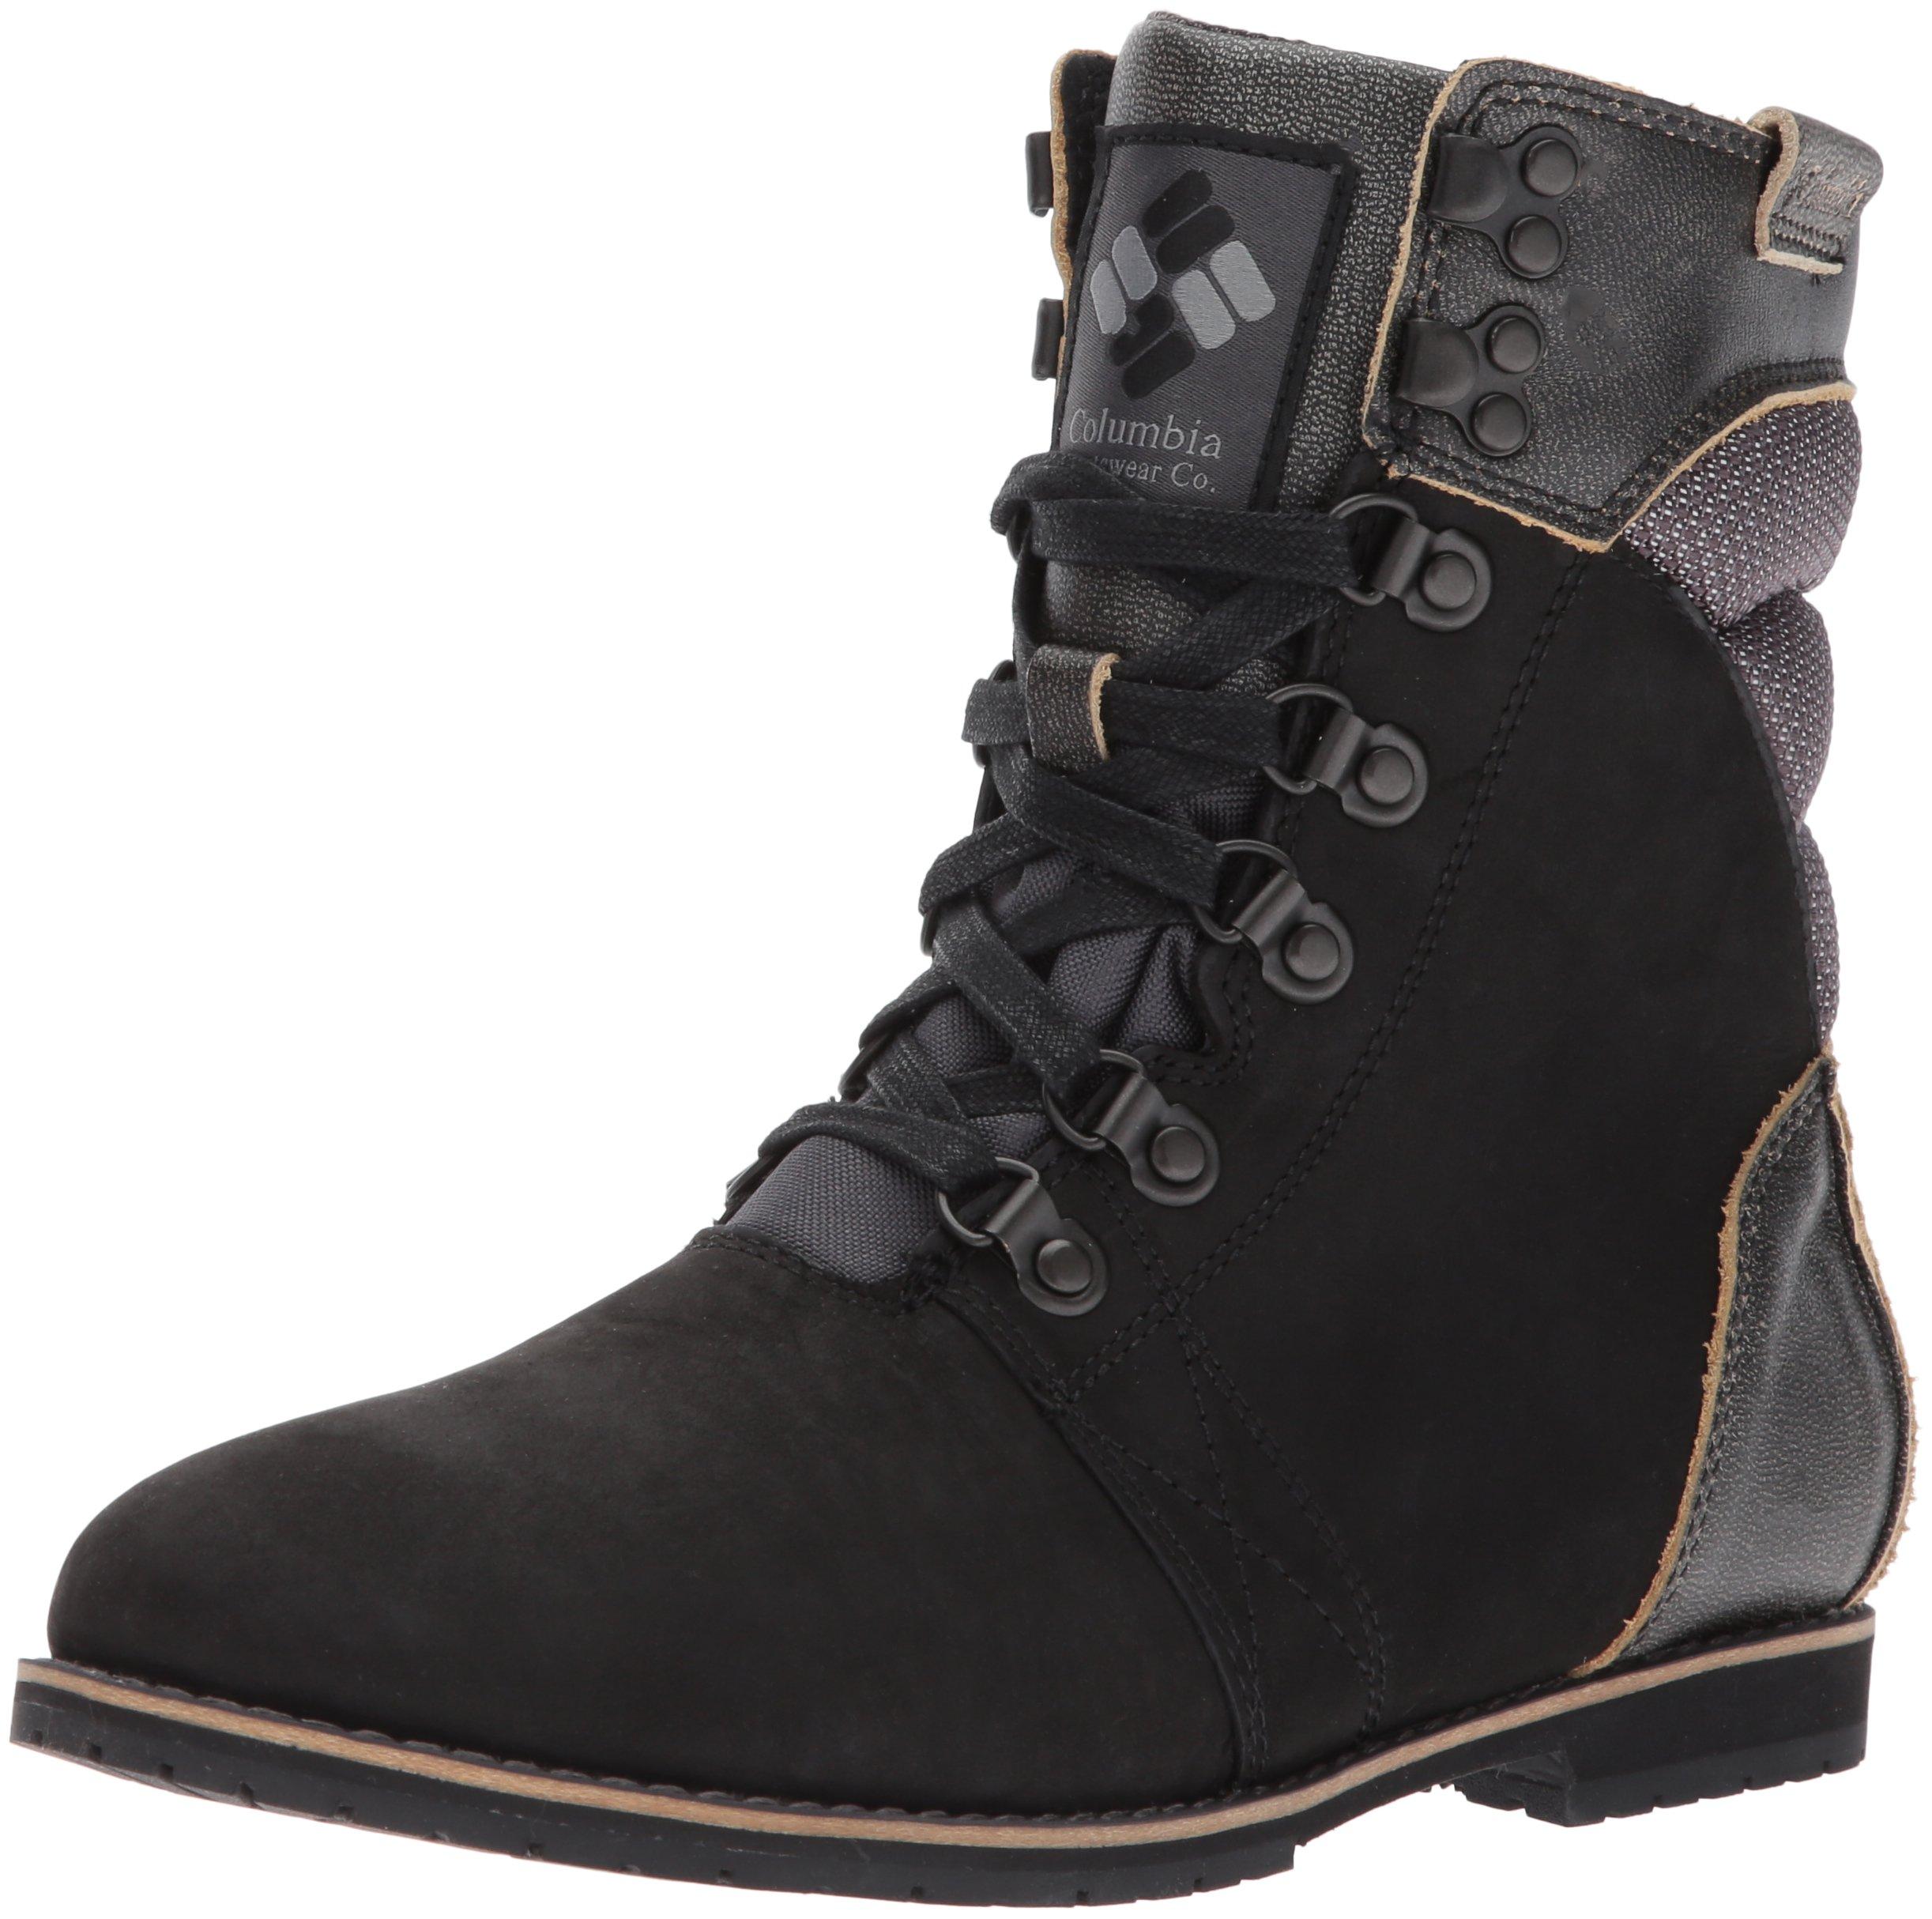 Columbia Women's Twentythird Ave Waterproof Mid Uniform Dress Shoe, Black, Ti Grey Steel, 6.5 B US